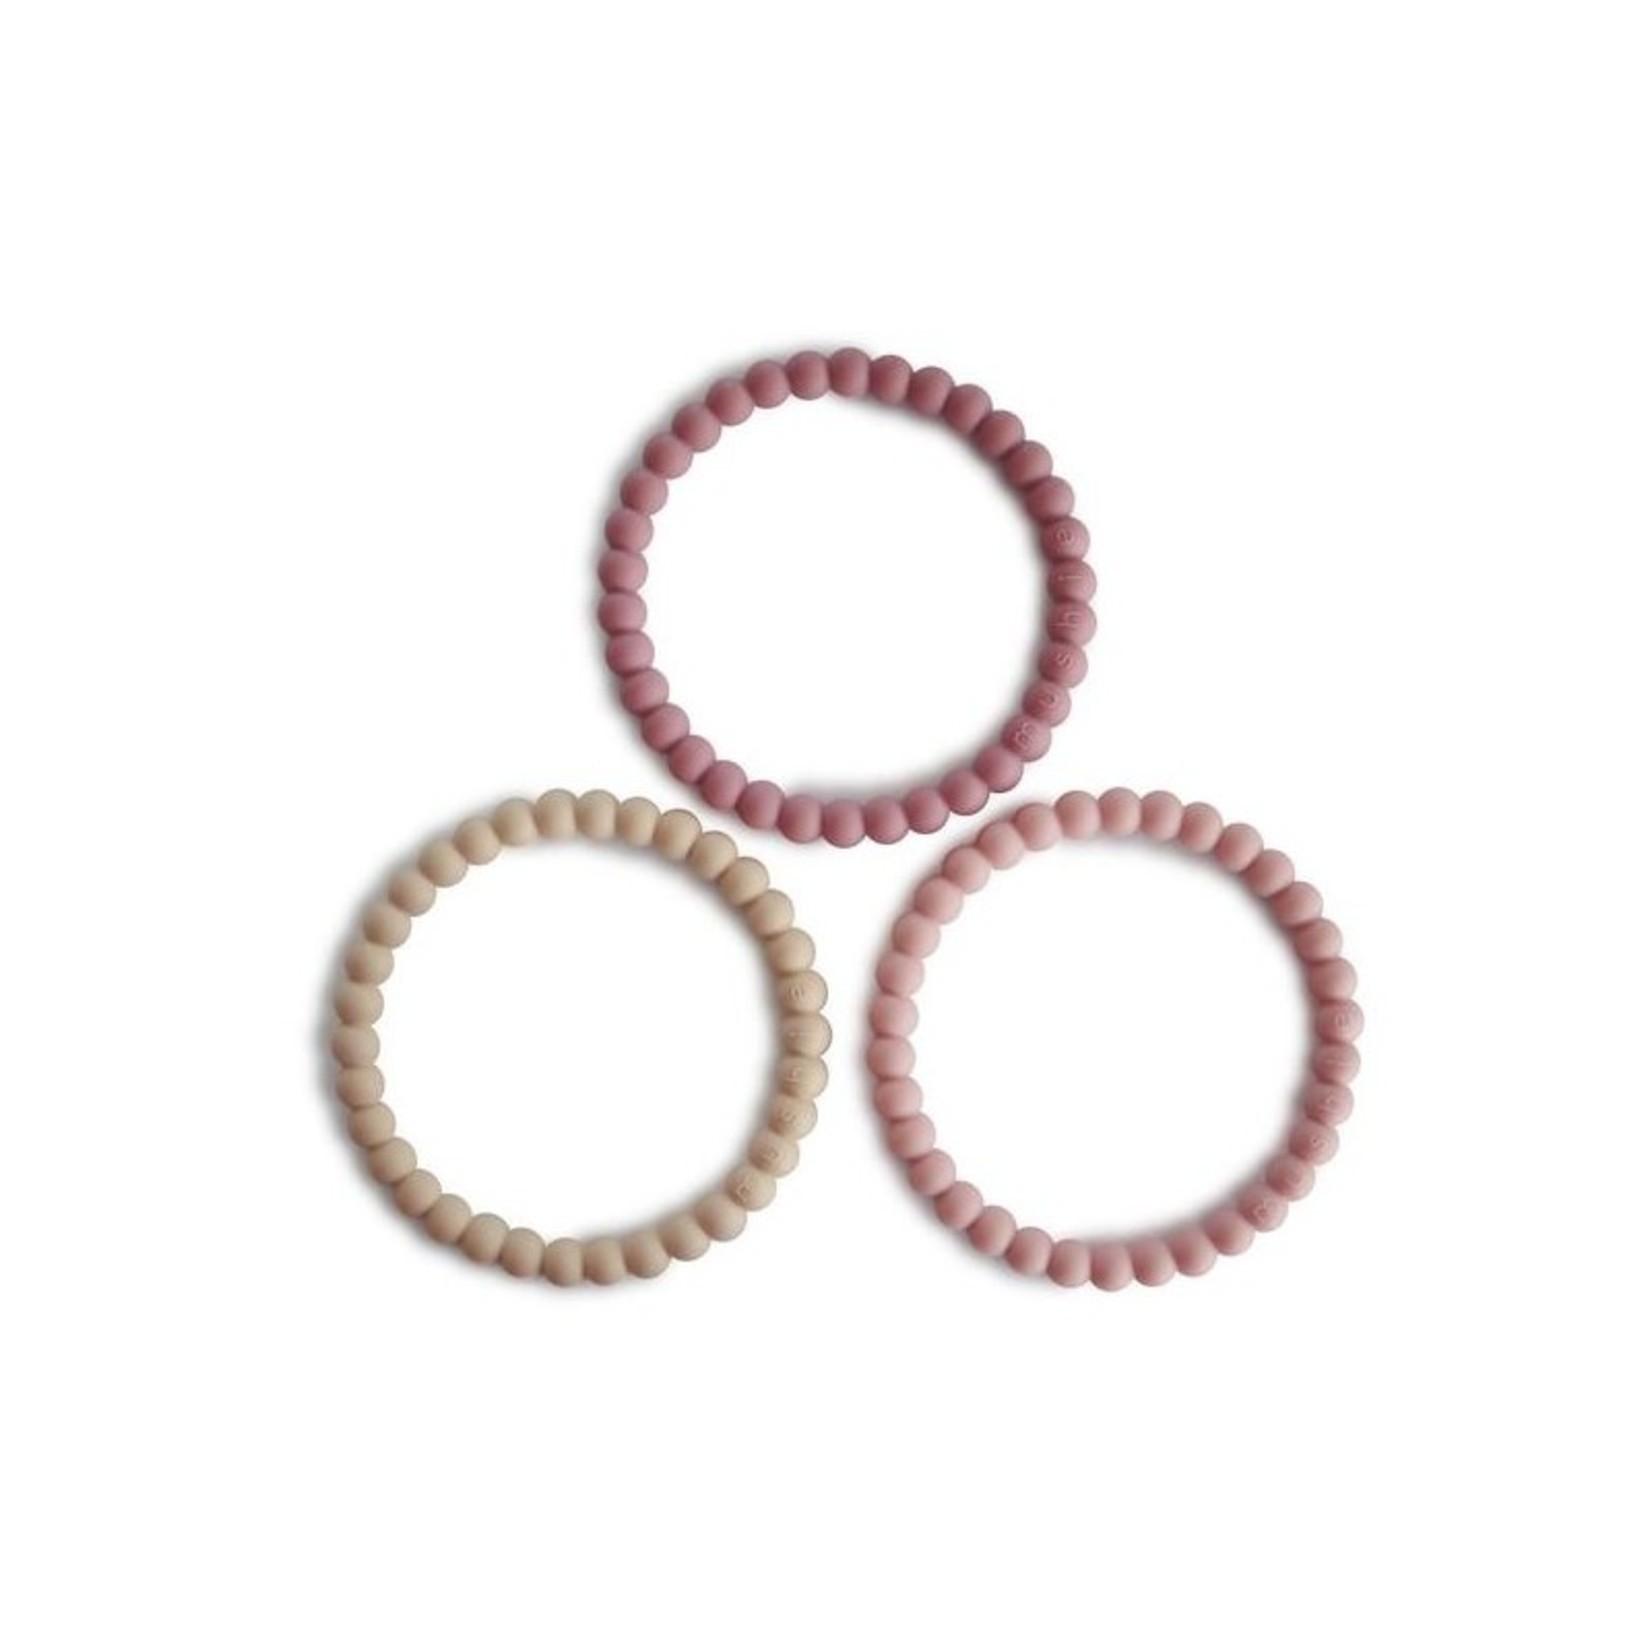 Mushie Mushie Silicone Bracelet/Bijtringen 3-pack Linen/peony/pale pink